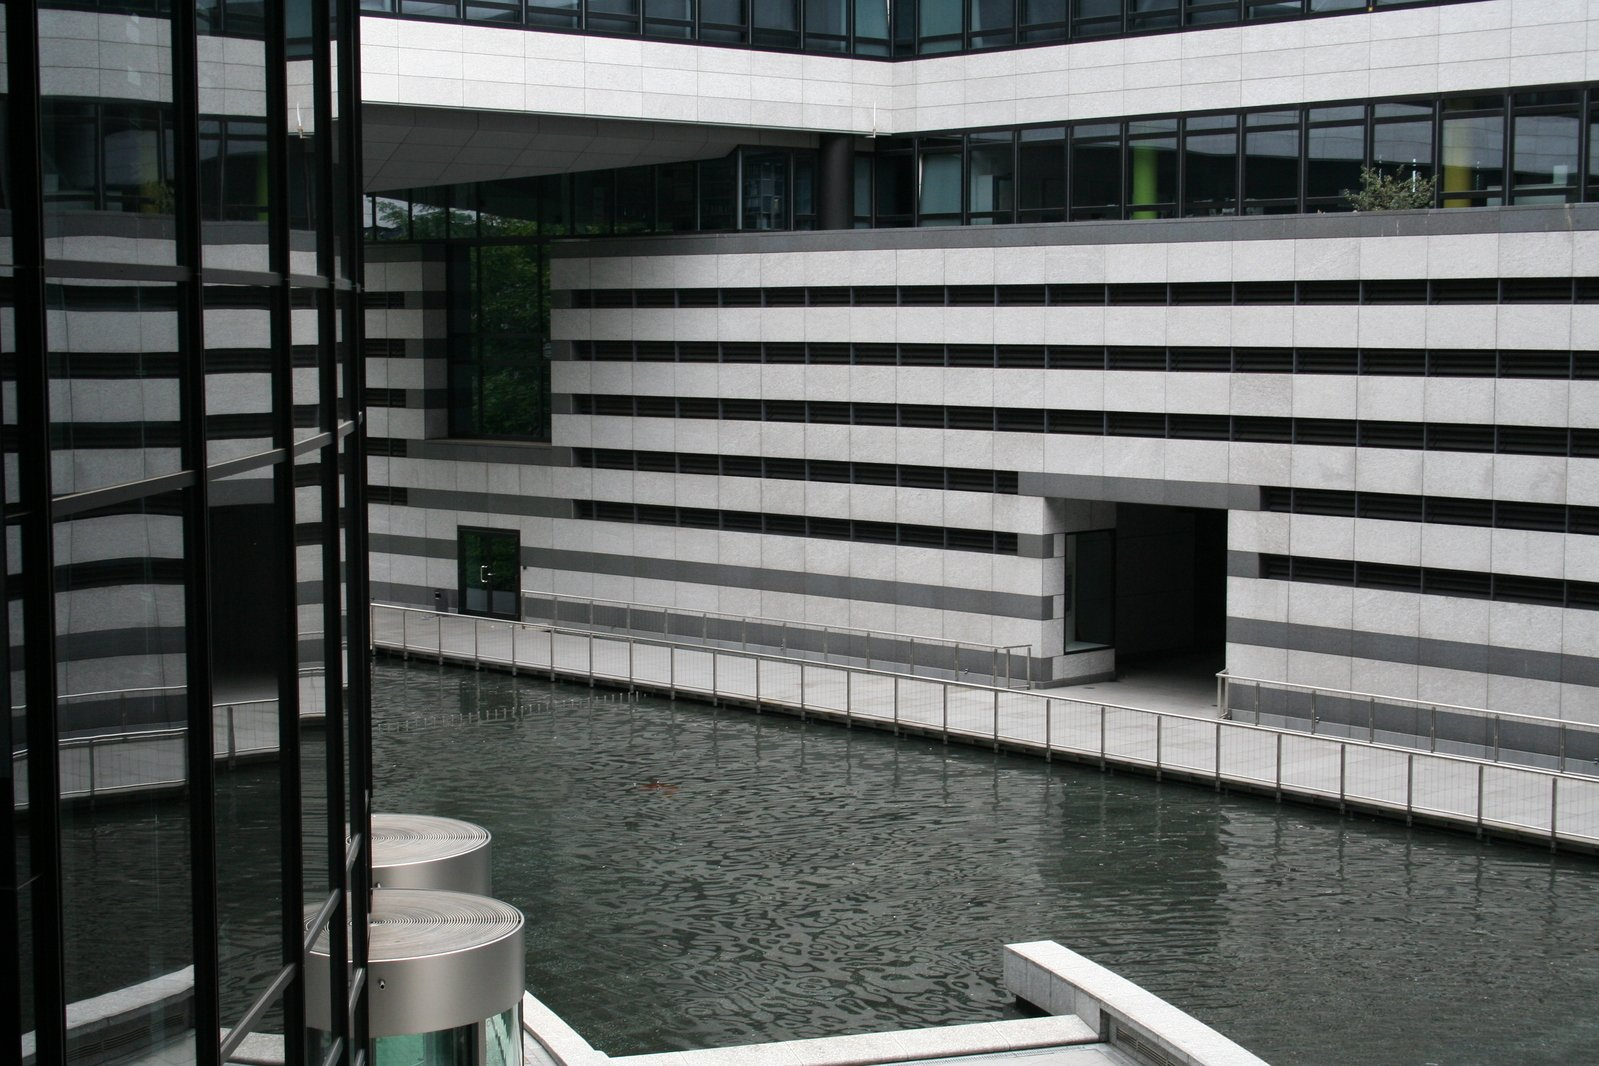 Free BW Bank Stuttgart, Germany Stock Photo